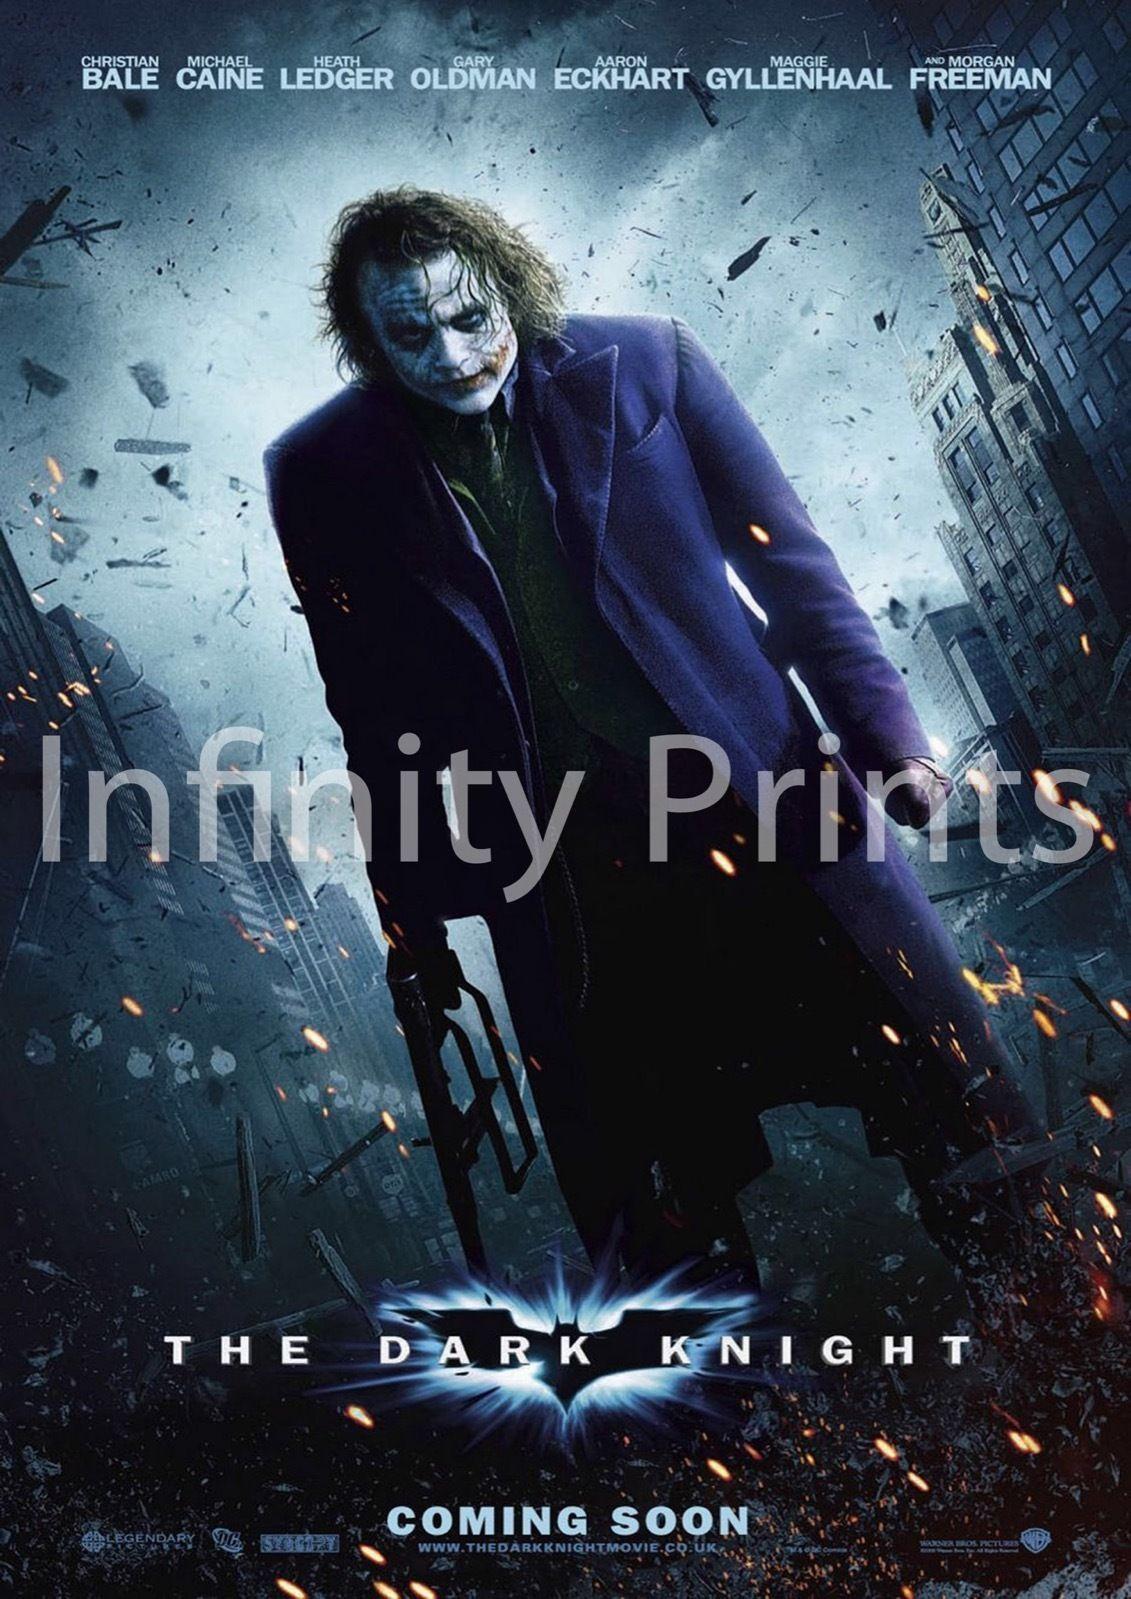 THE DARK KNIGHT WHY SO SERIOUS MOVIE POSTER FILM A4 A3 ART PRINT CINEMA